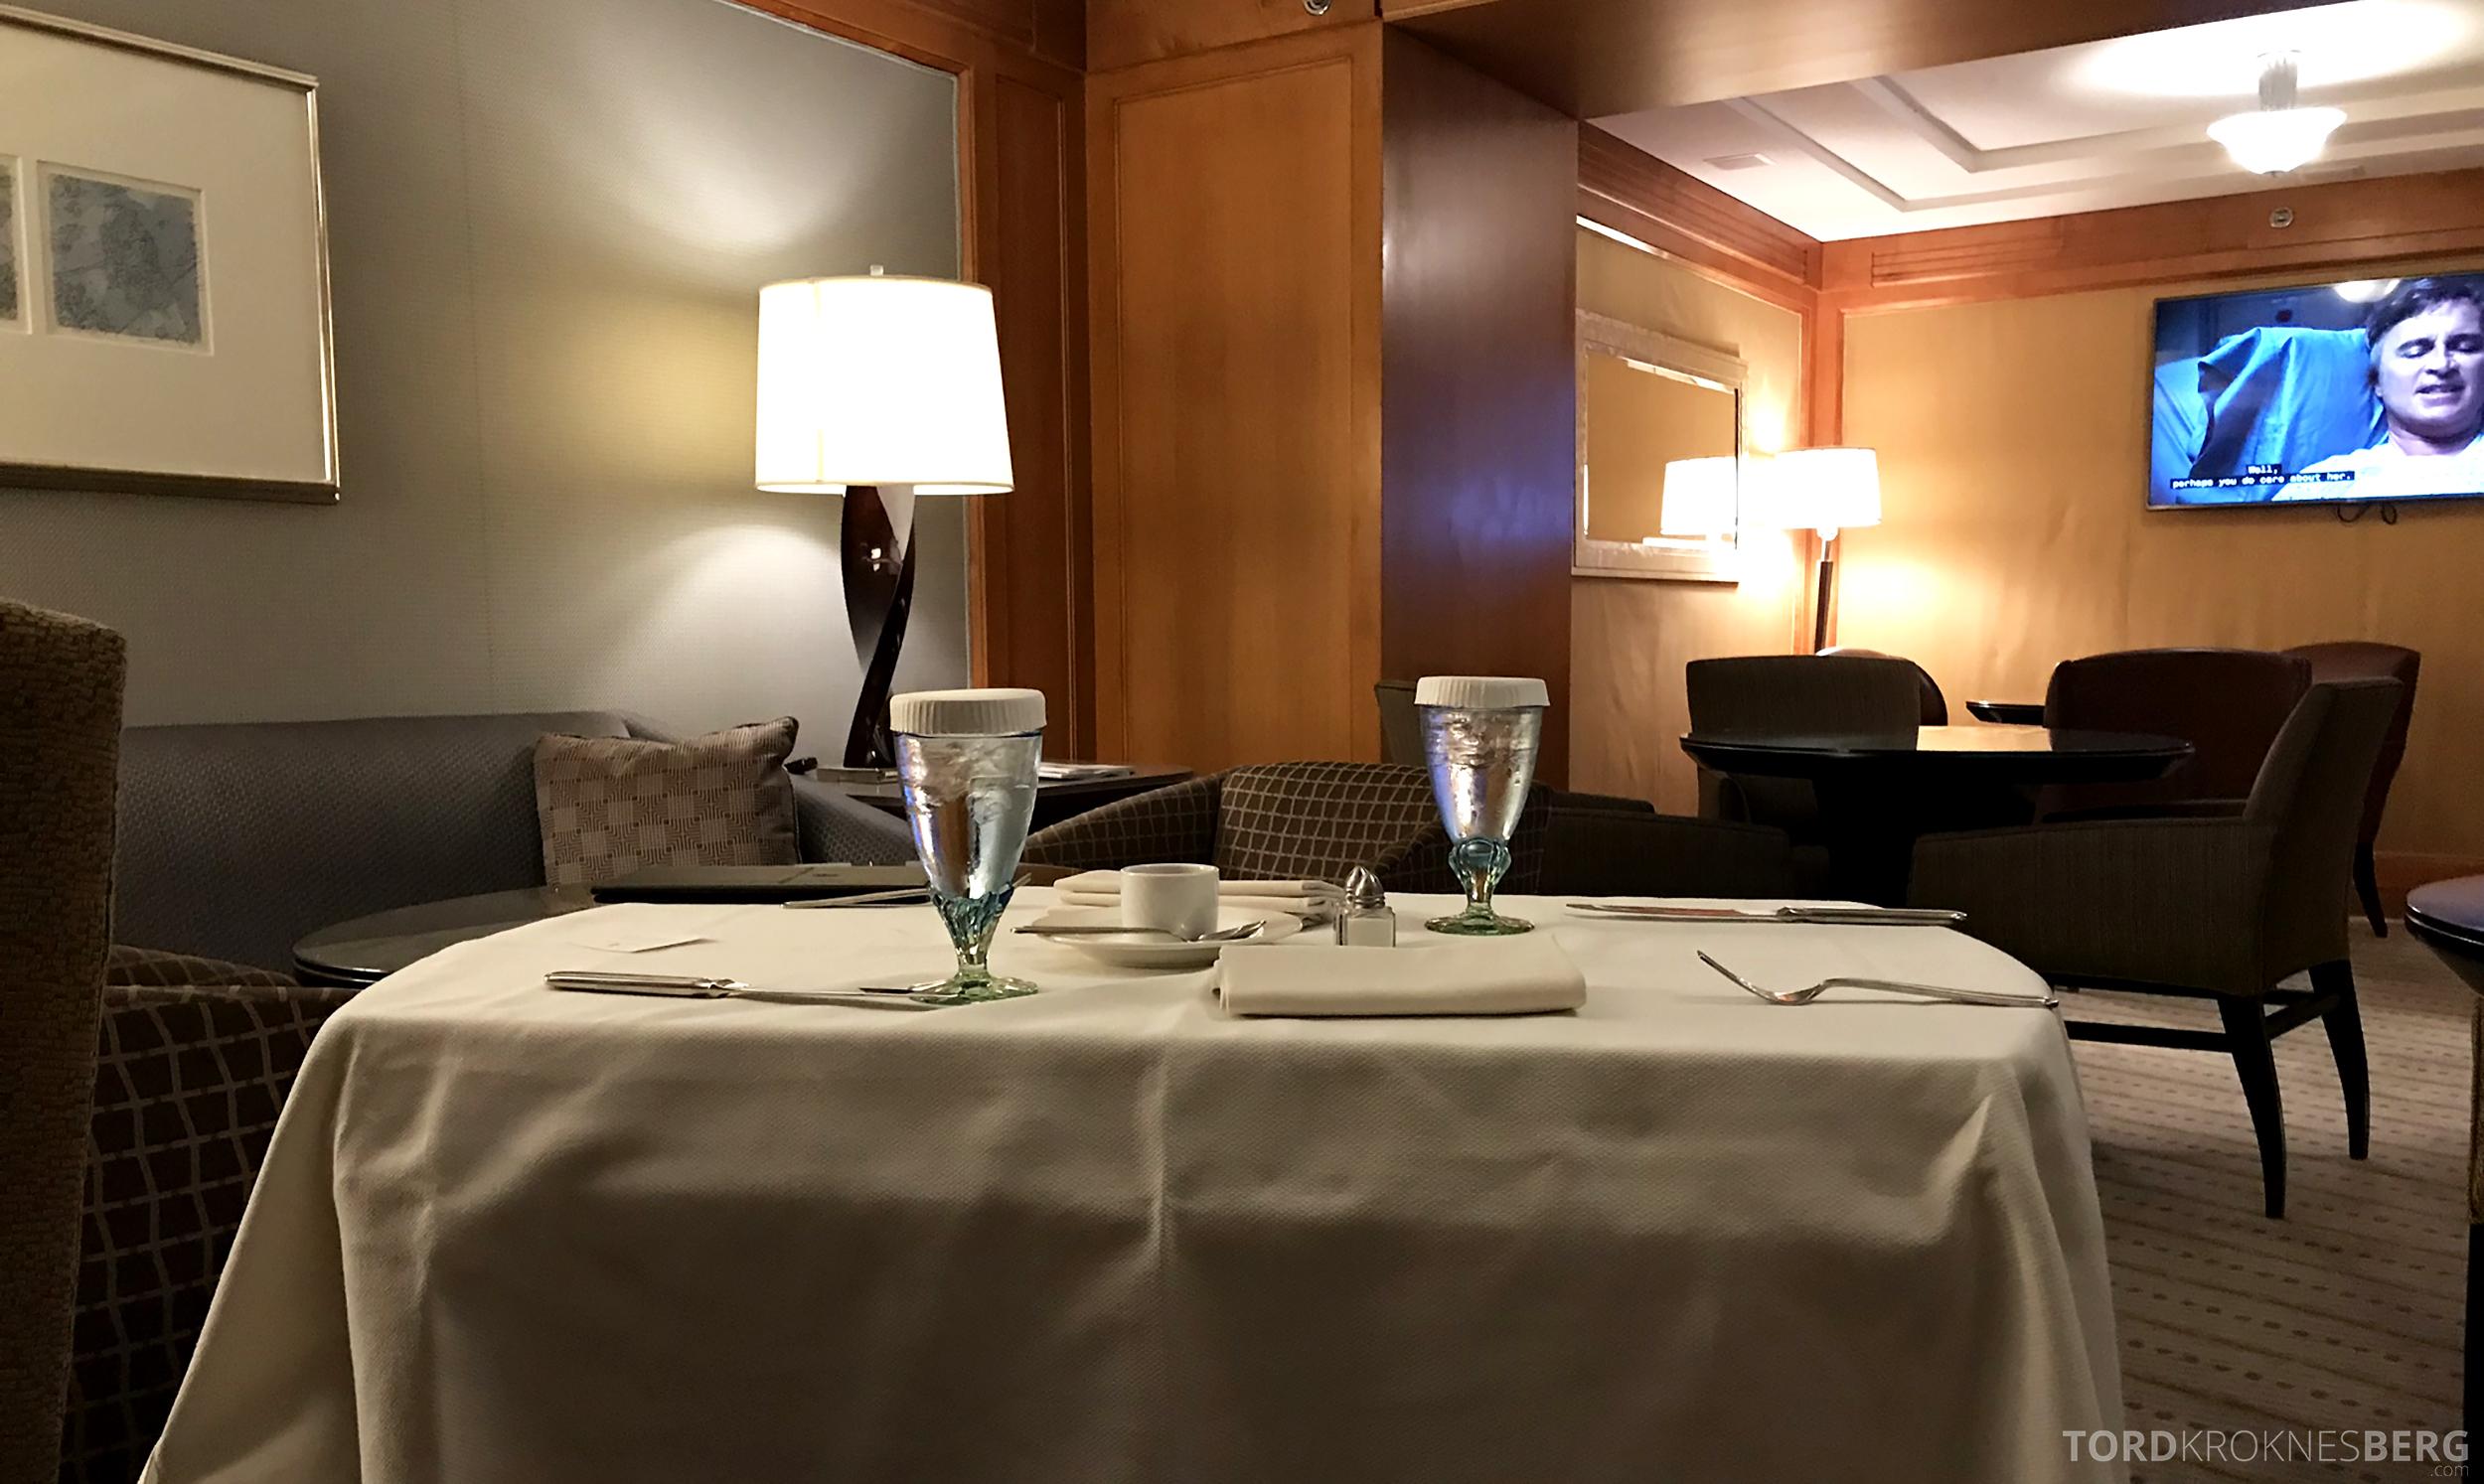 Ritz-Carlton New York Club Lounge room service